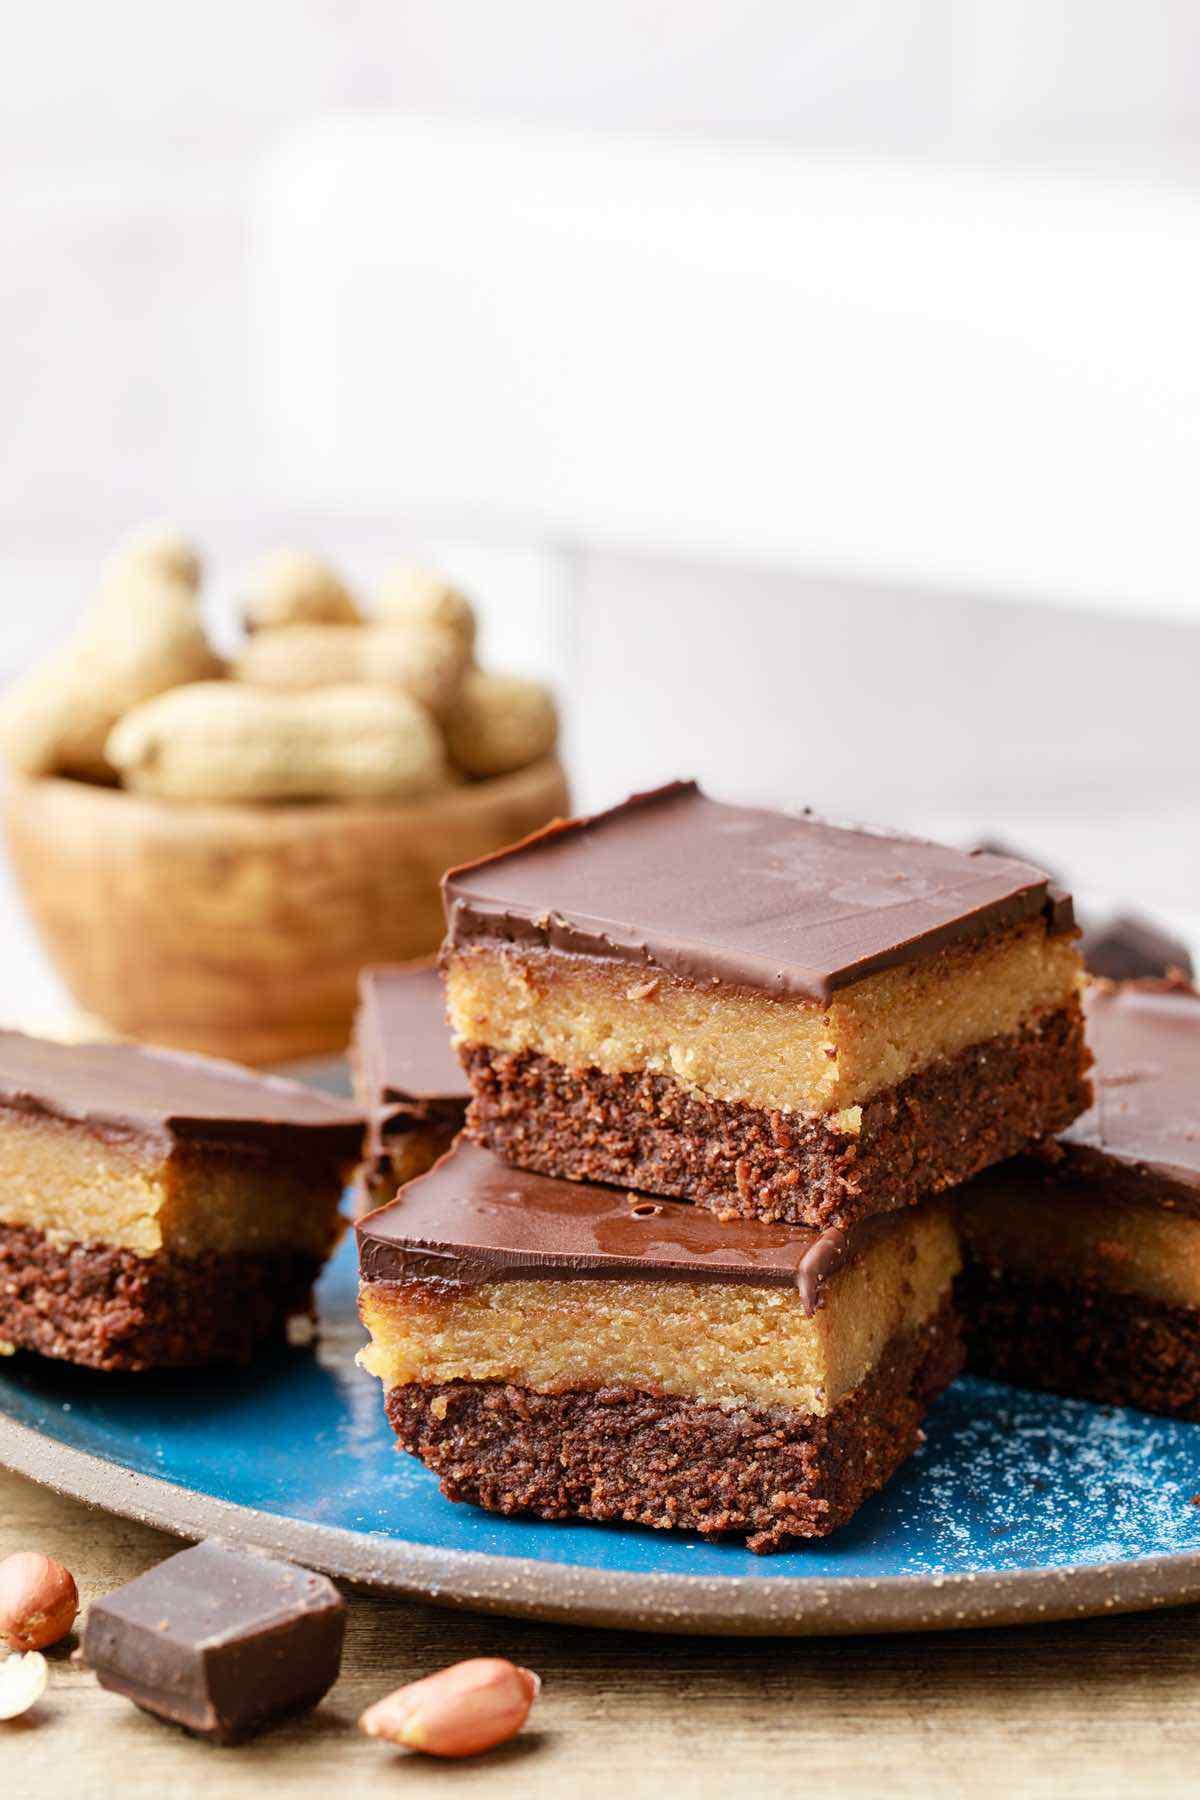 Keto Peanut Butter Chocolate Bar